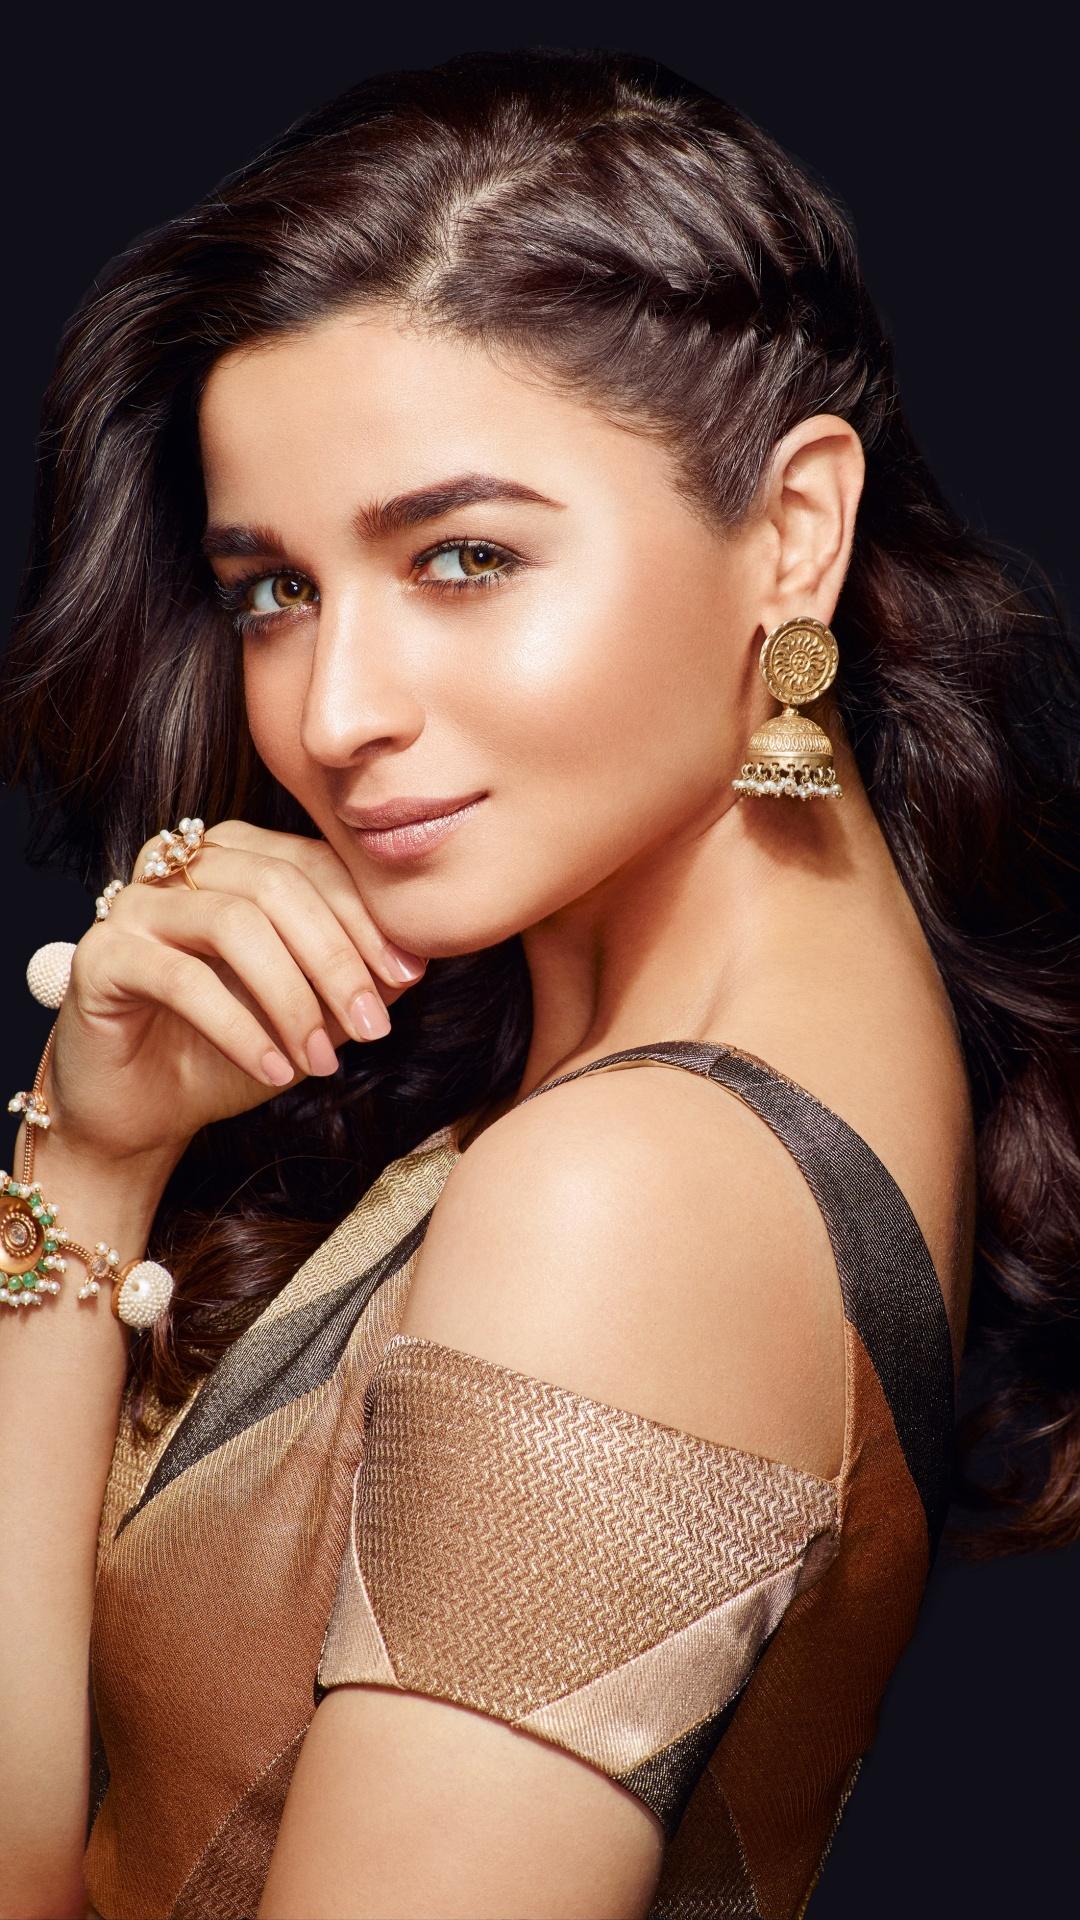 Cute Actress Alia Bhatt HD Wallpapers download